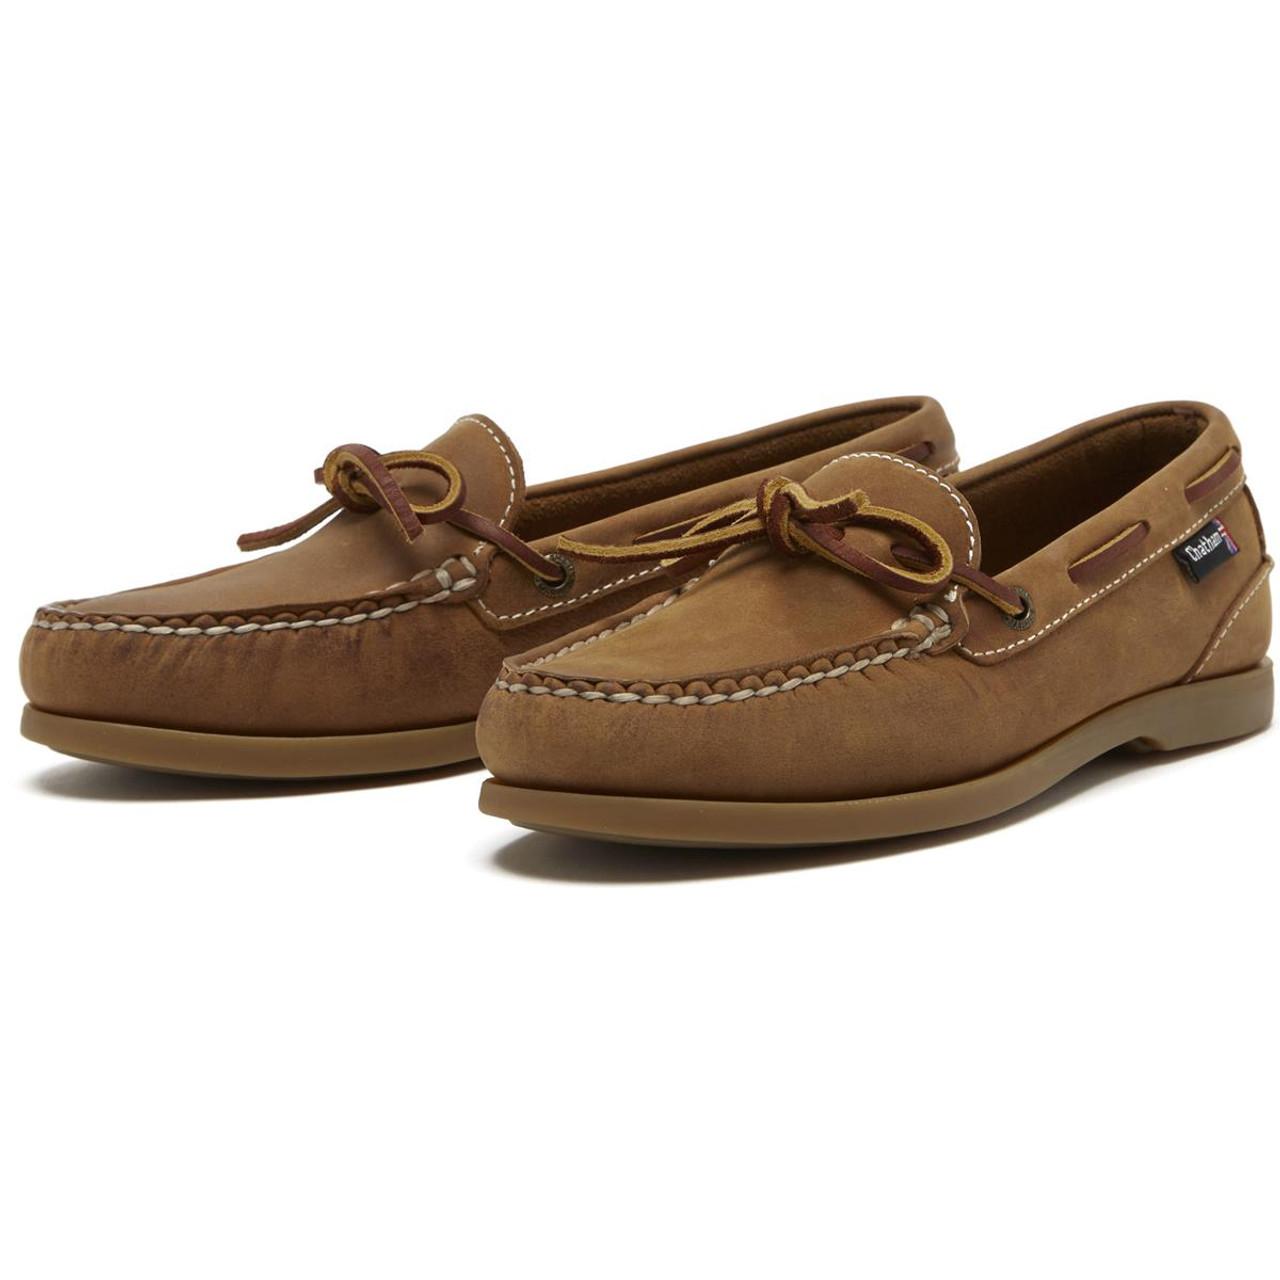 Chatham Olivia G2 Deck Shoes